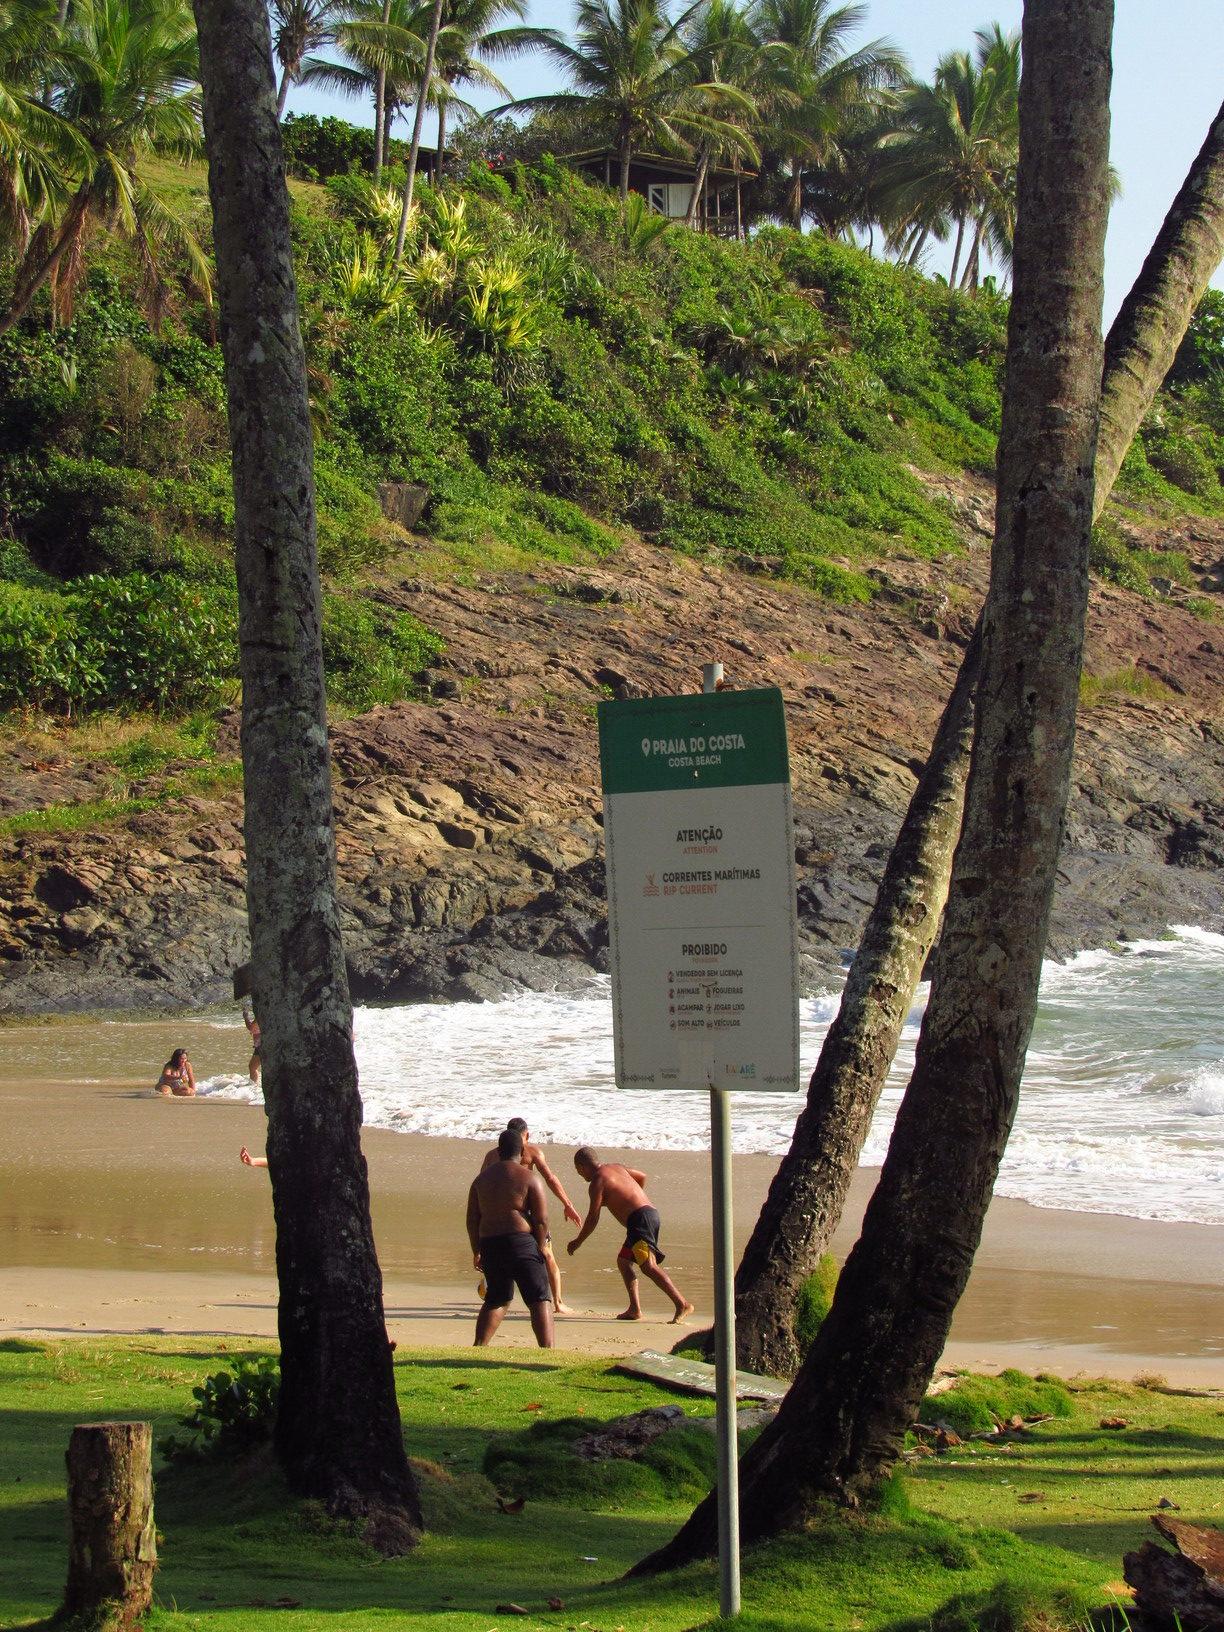 praia da costa itacare bahia